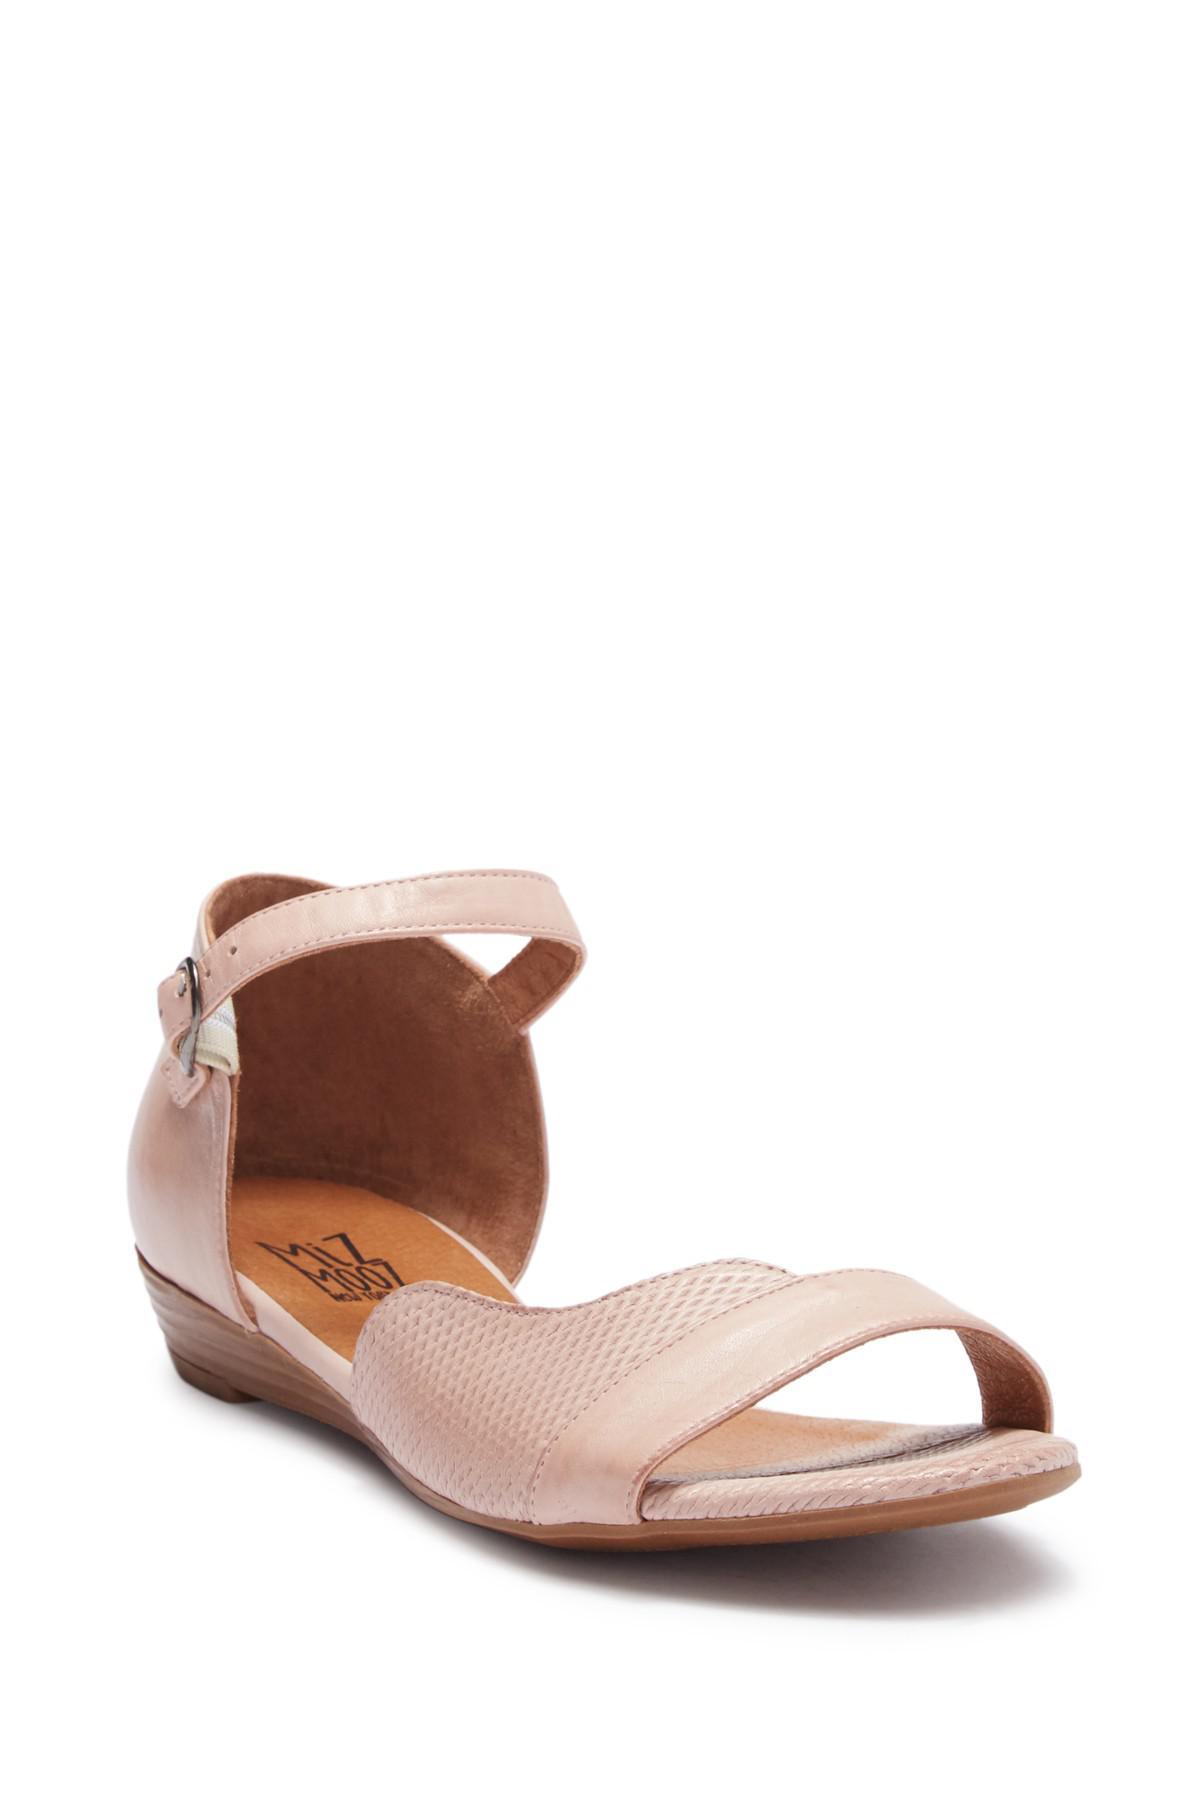 Miz Mooz Addison Ankle Strap Sandal z3D2dT